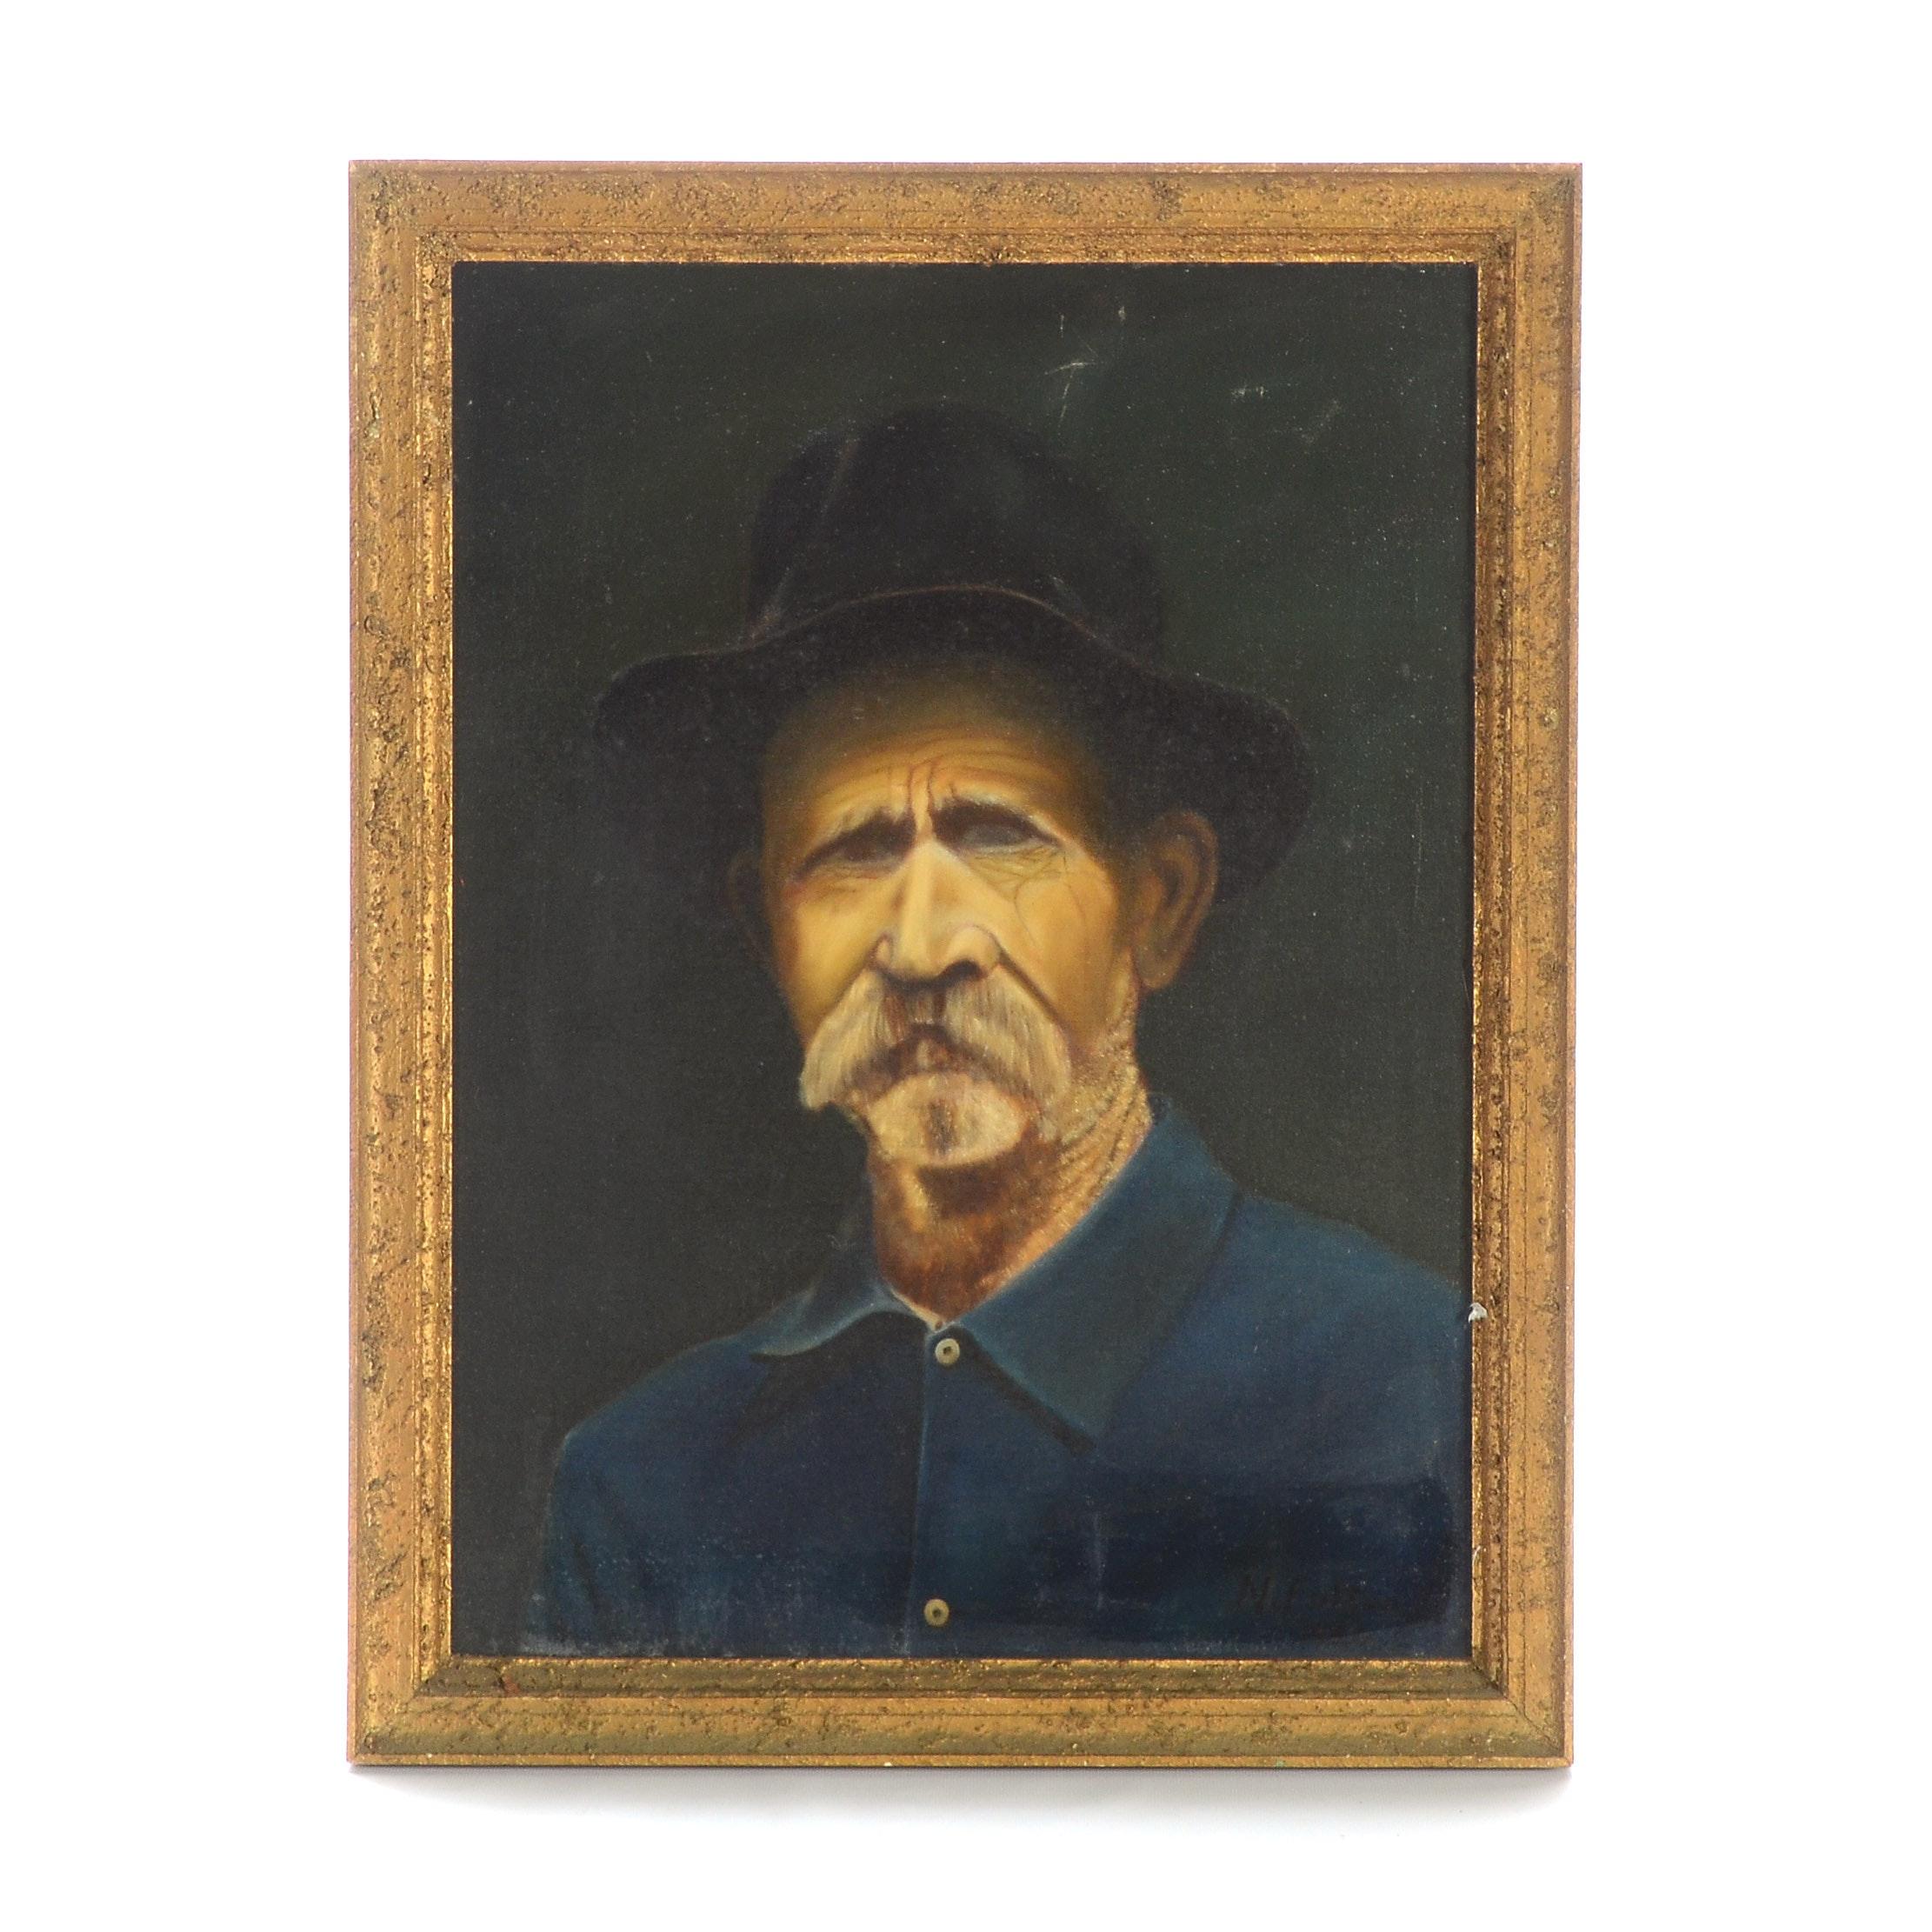 N. Fulton Original Vintage Oil on Canvas Portrait